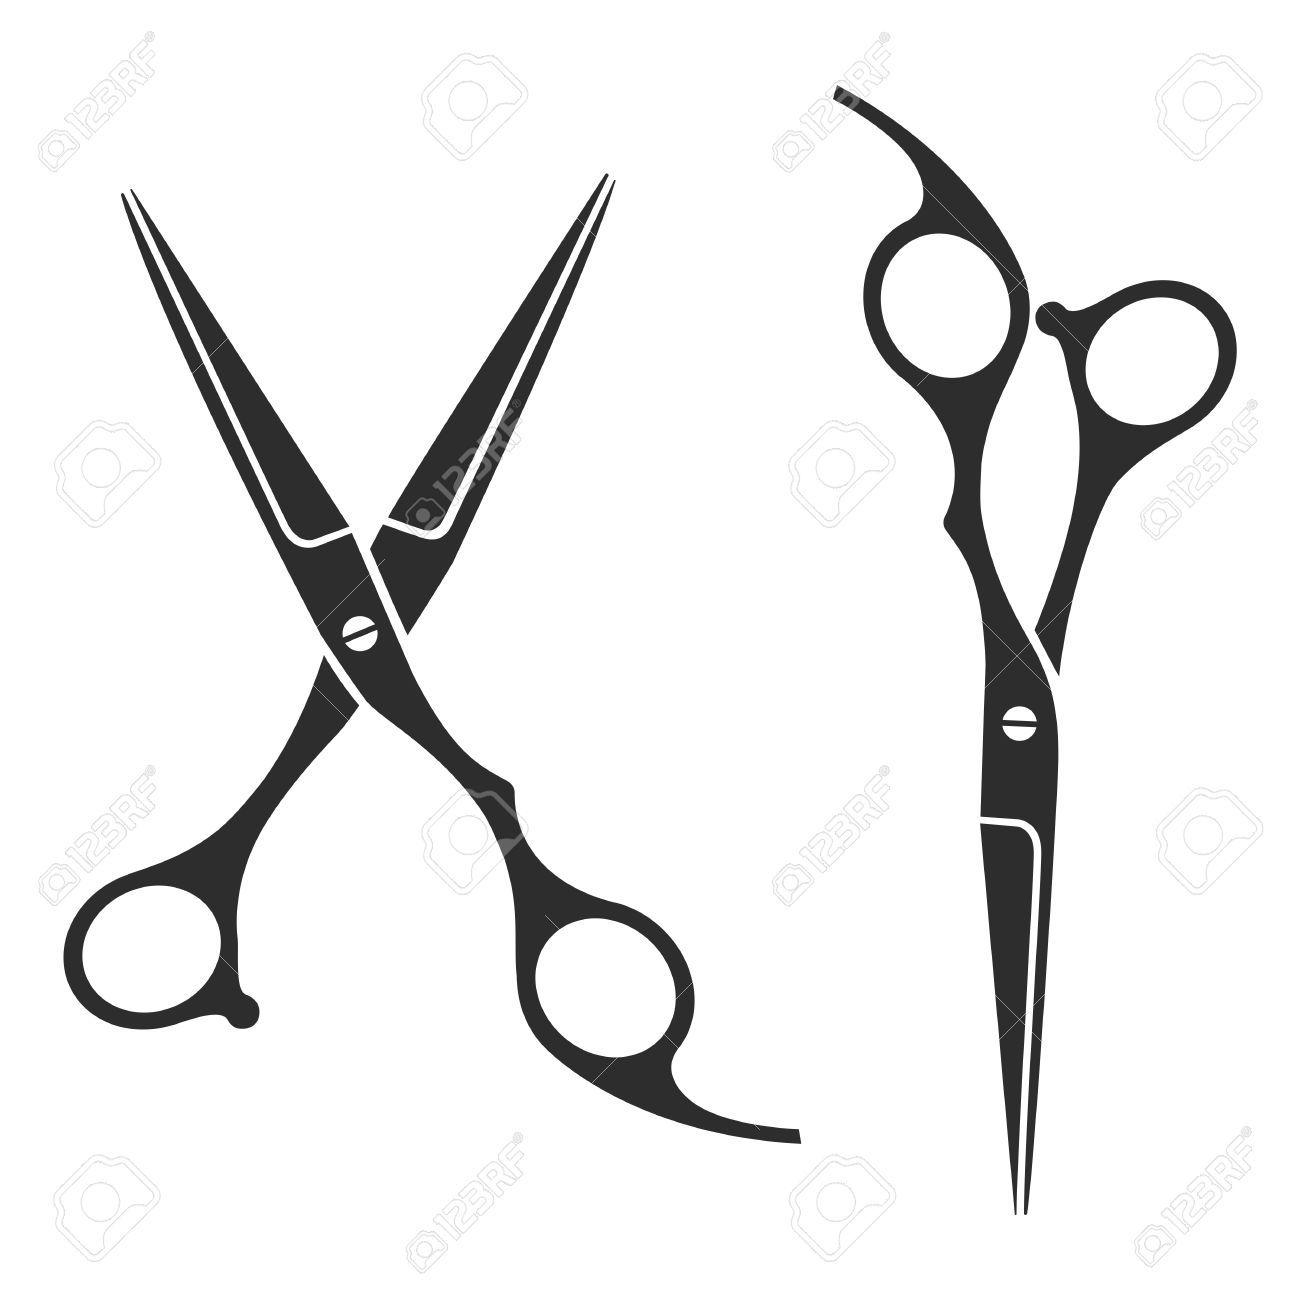 Scissors Vector Logo - scissors vector by keiry image ...